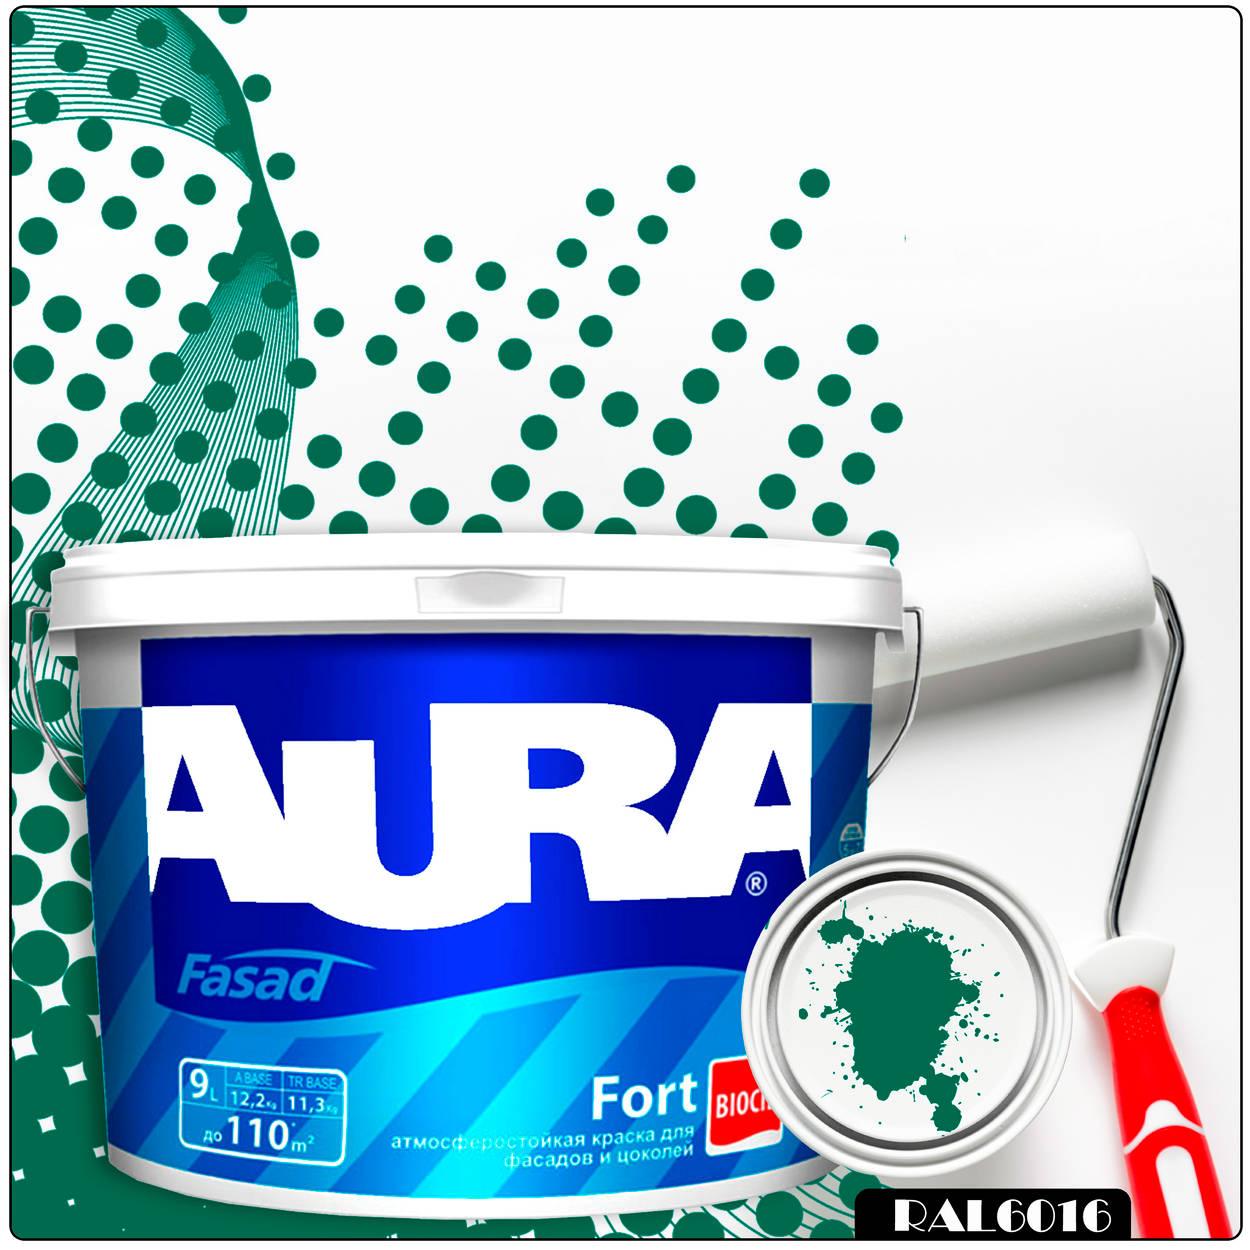 Фото 17 - Краска Aura Fasad Fort, RAL 6016 Бирюзово-зелёный, латексная, матовая, для фасада и цоколей, 9л, Аура.